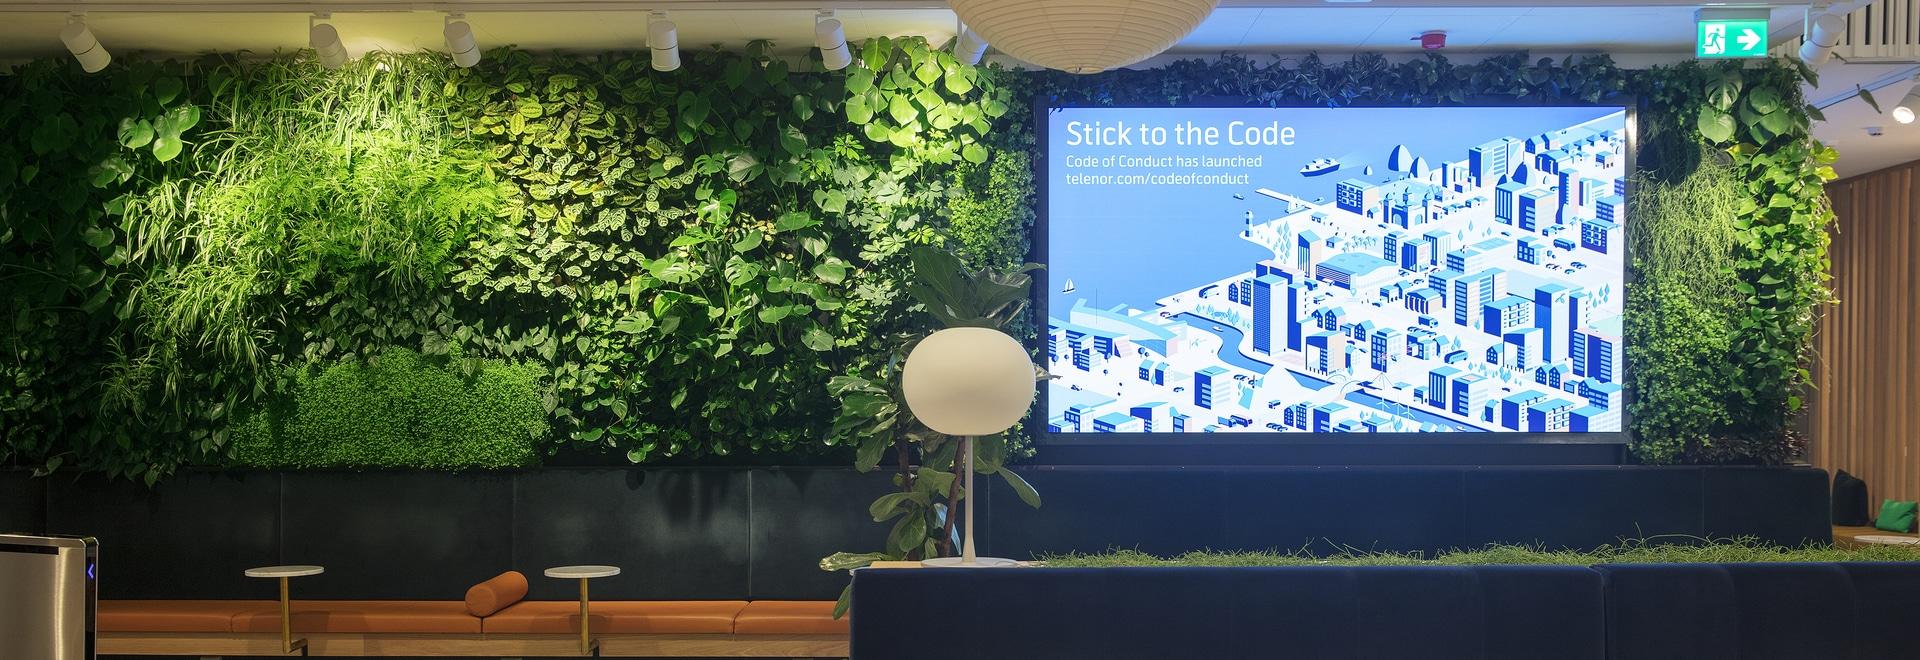 Vertical garden at Telenor head office